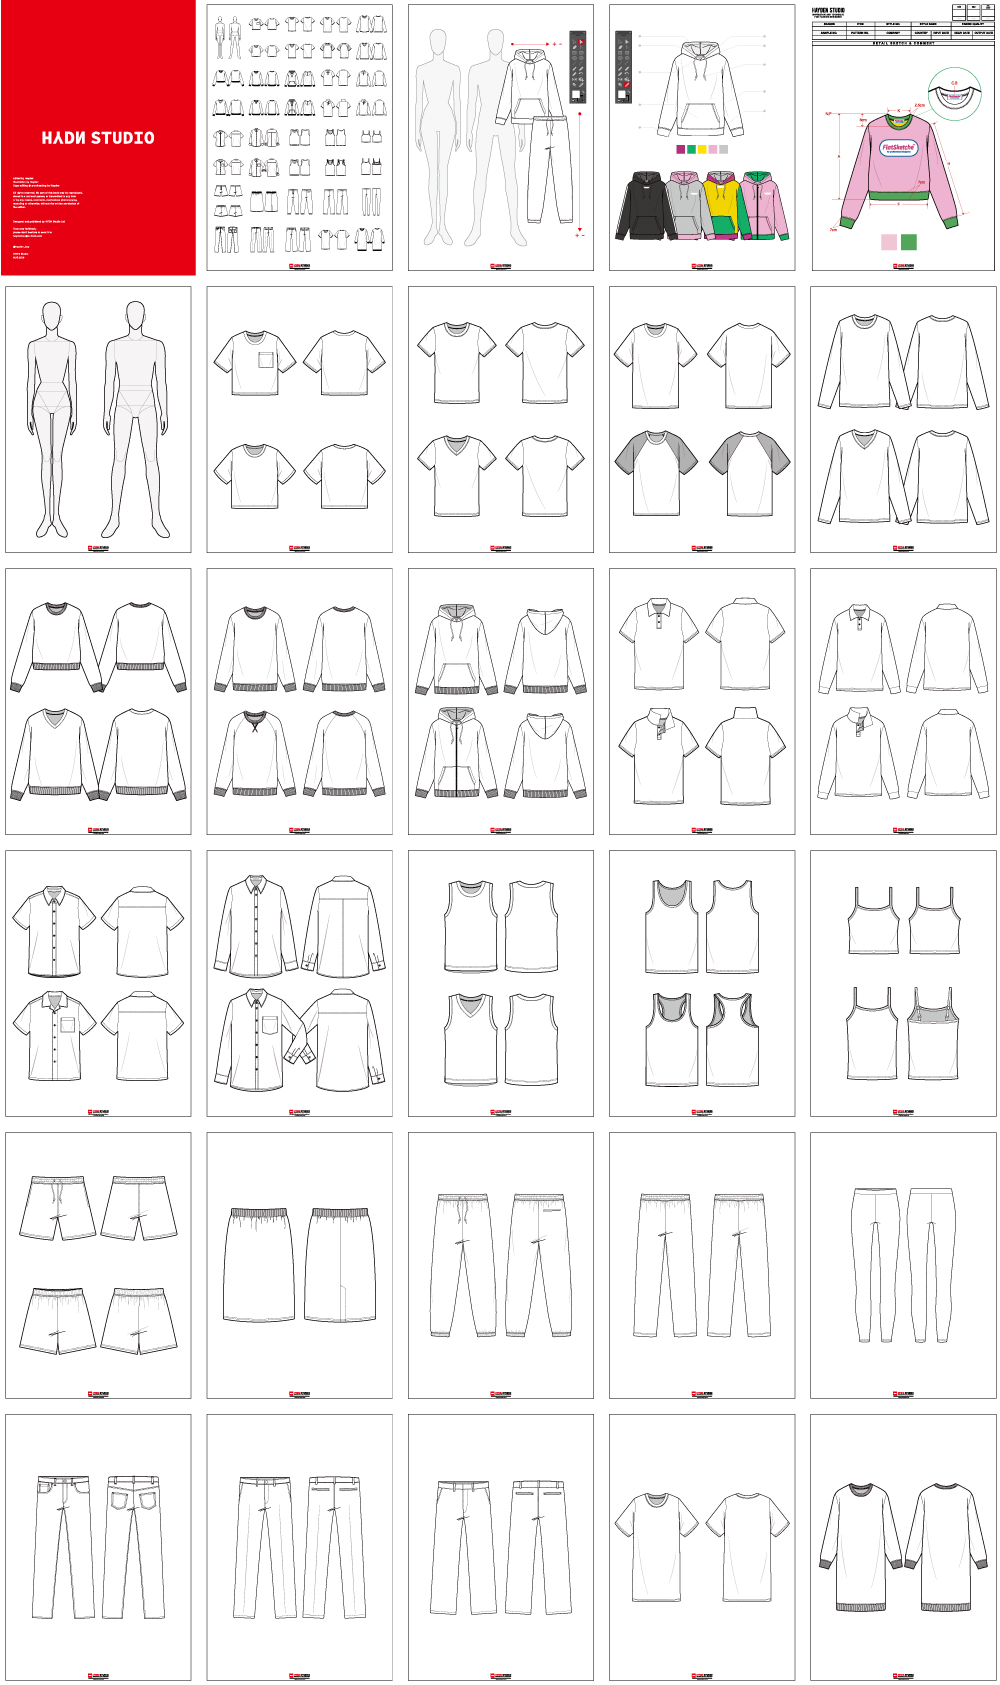 Vector Fashion Flats Design Set Fashion Template Fashion Flats Fashion Illustration Fashion Template Hydnstudio Fashion Design